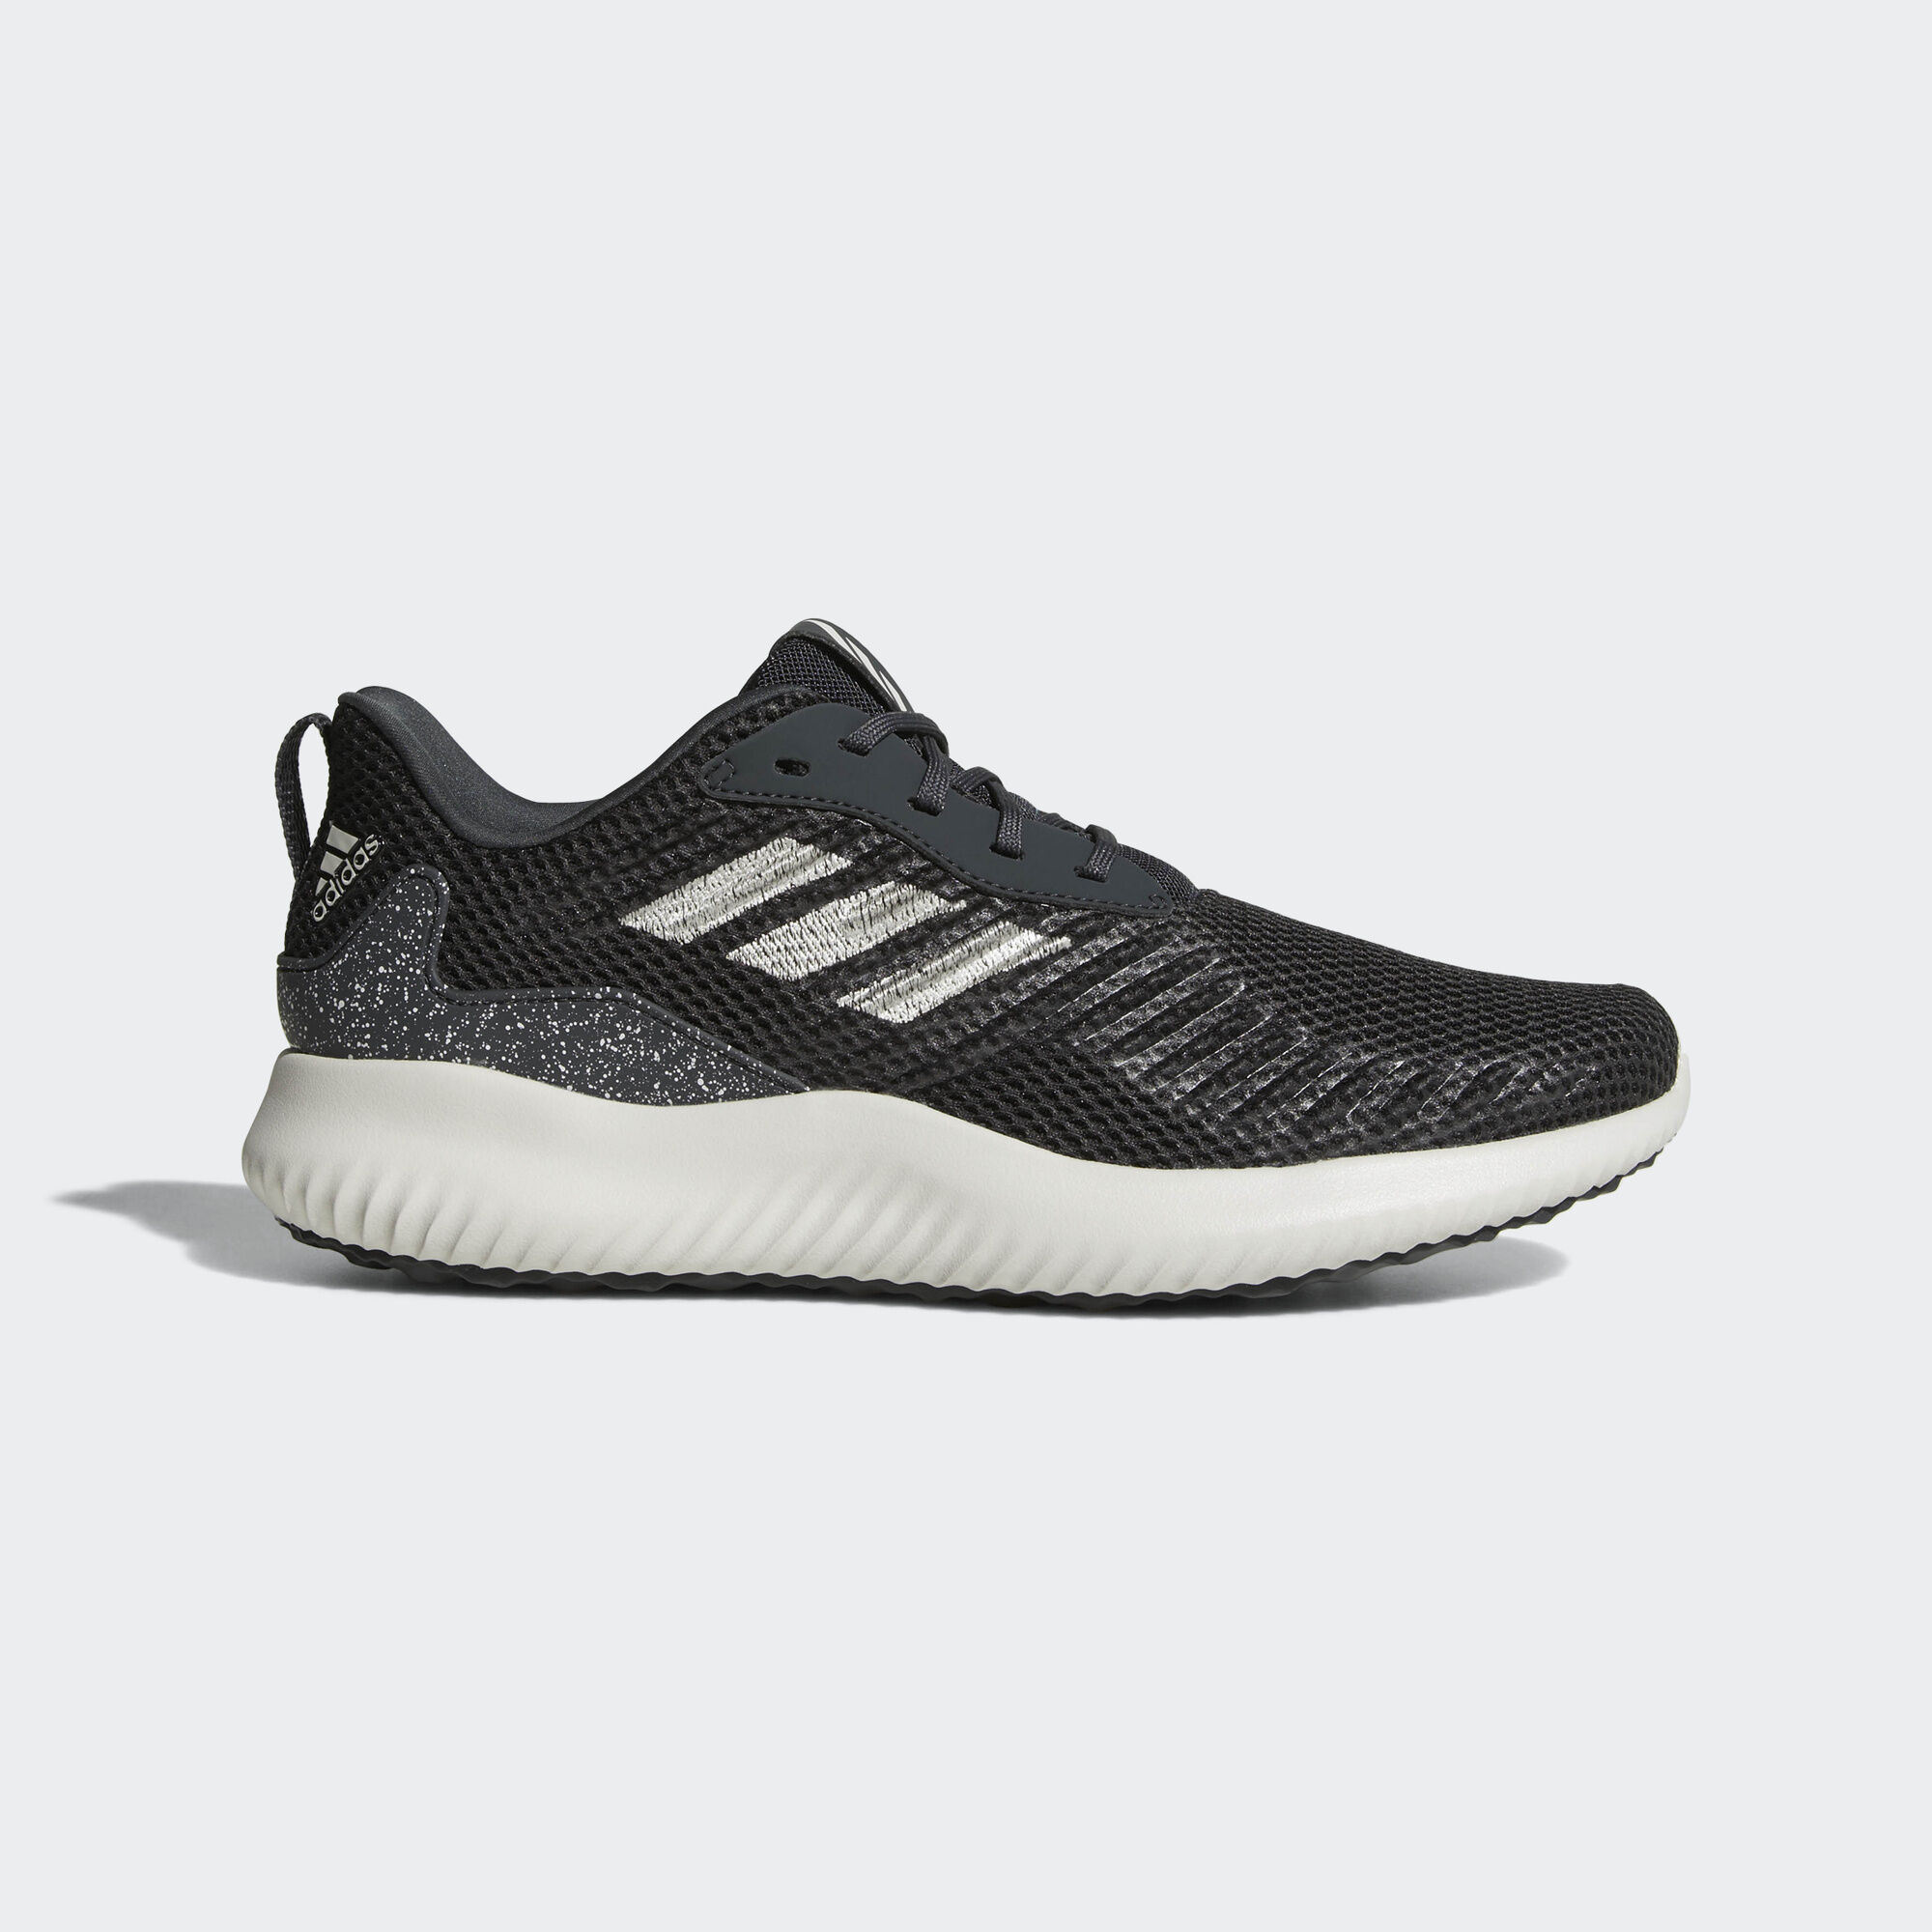 adidas alphabounce rc scarpe adidas europa / africa grigia